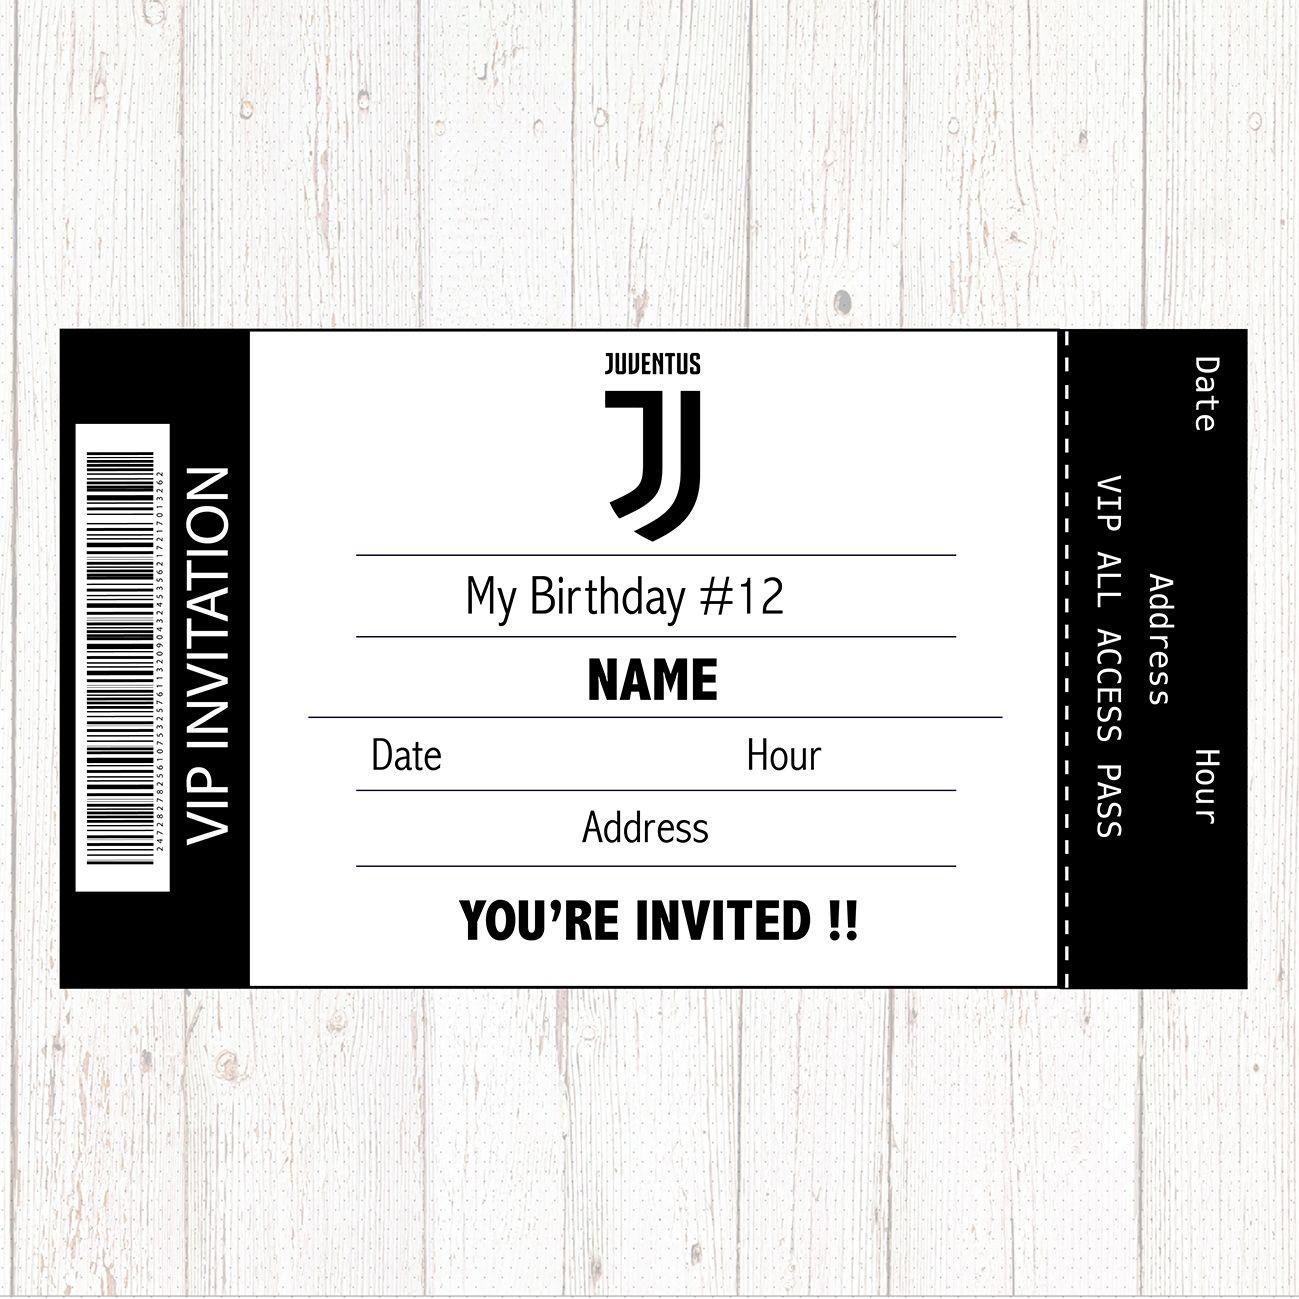 Juventus Invitation Printable Digital Birthday Party